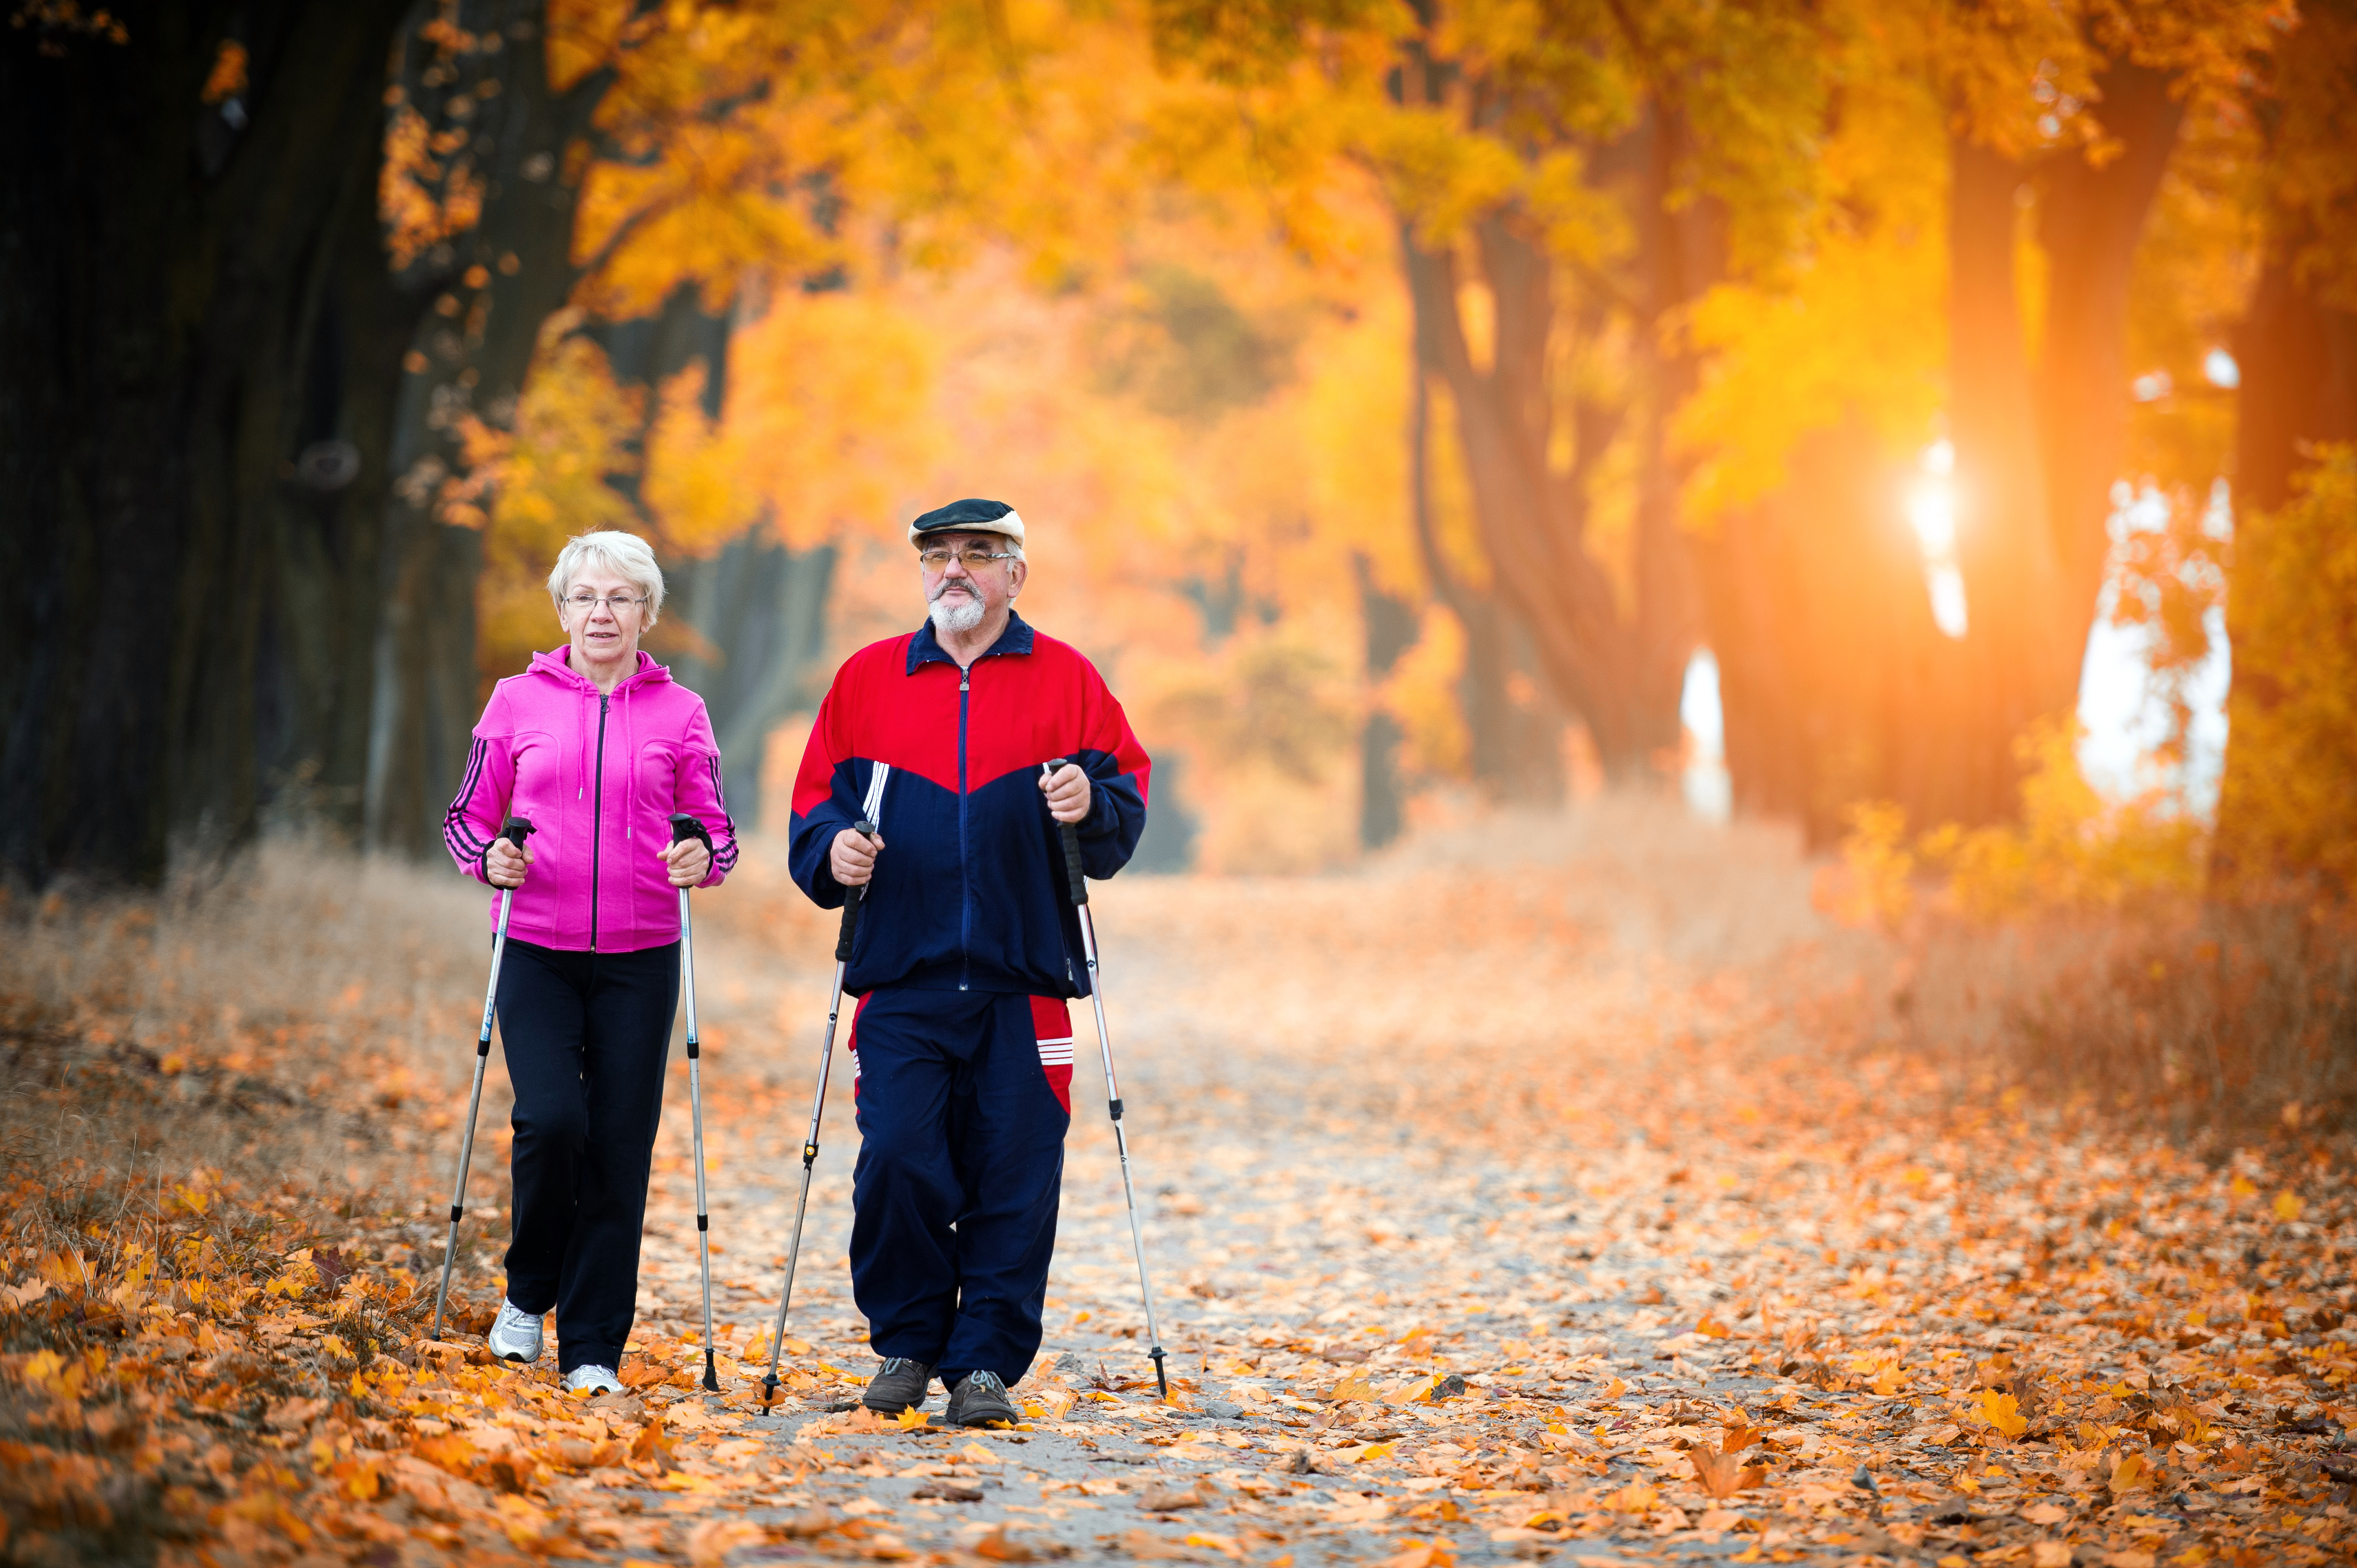 Arthritis Foundation Walk with Ease